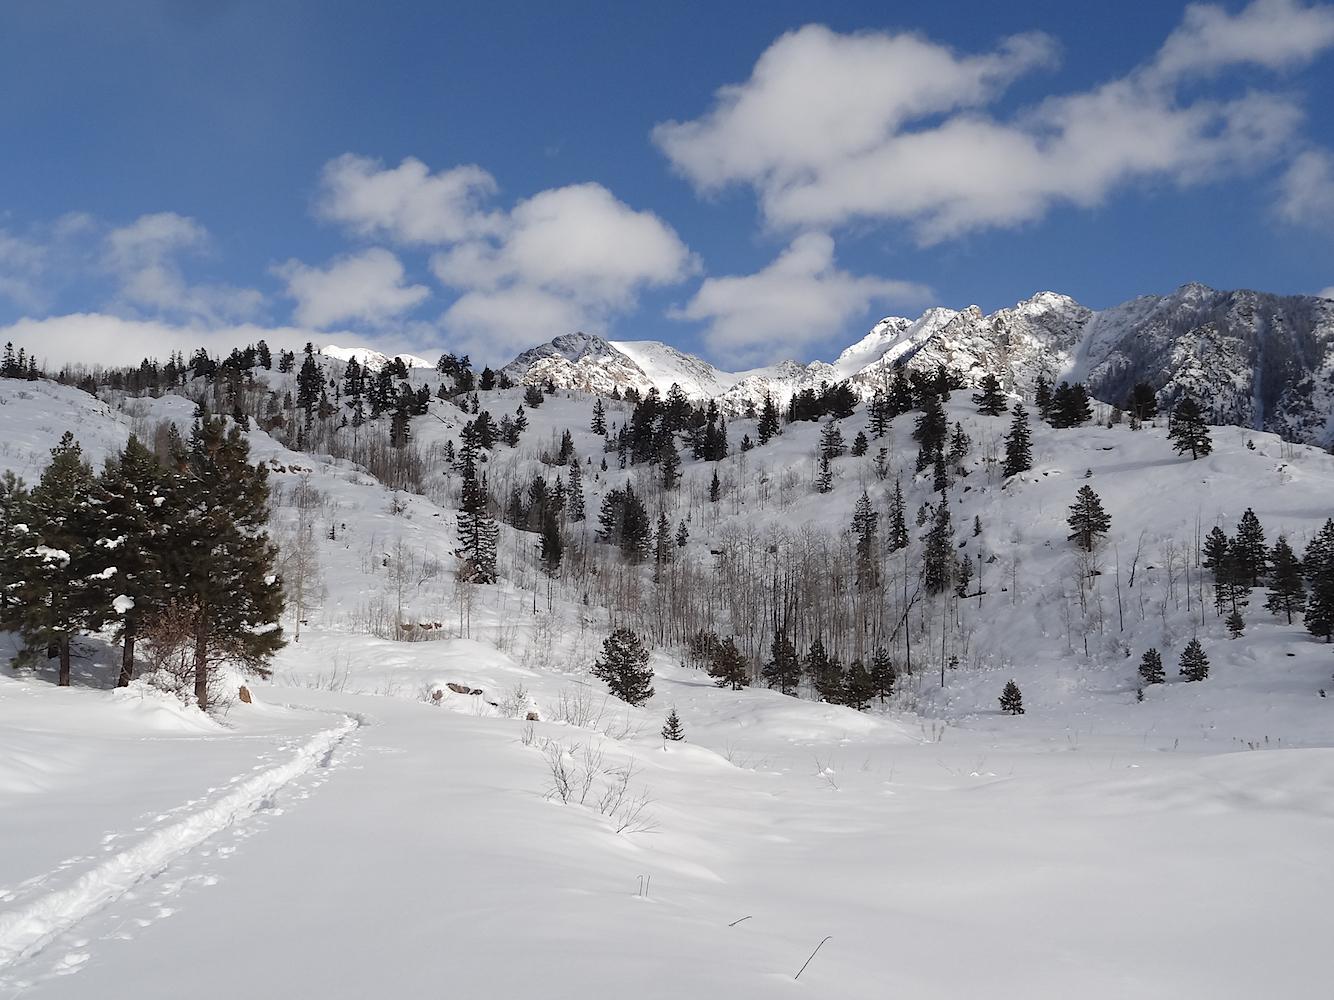 Lime Creek Road Snowshoe, Image #5356